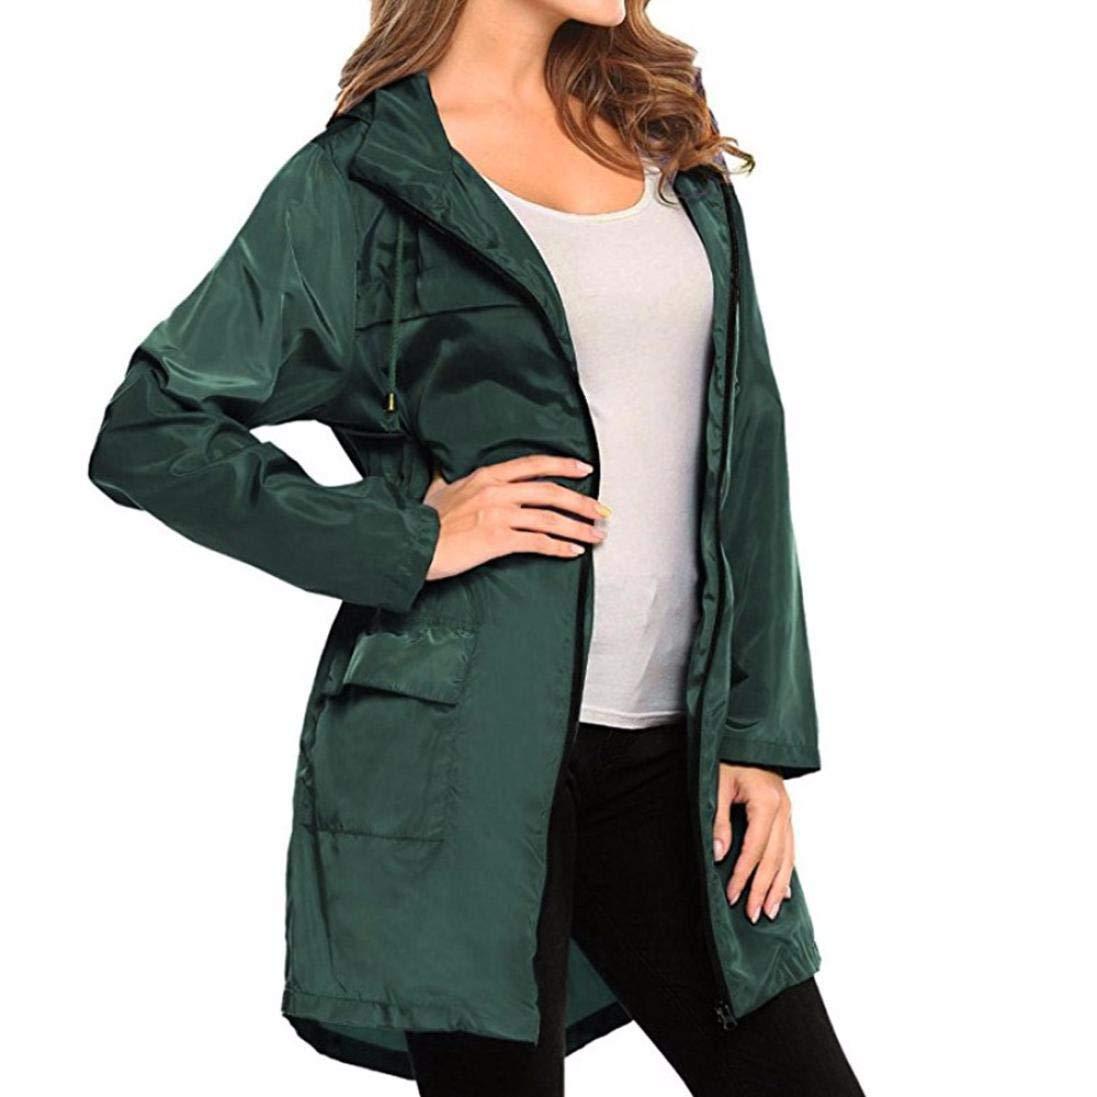 Jacket Womens,Gillberry Lightweight Travel Waterproof Raincoat Hoodie Windproof Hiking Coat